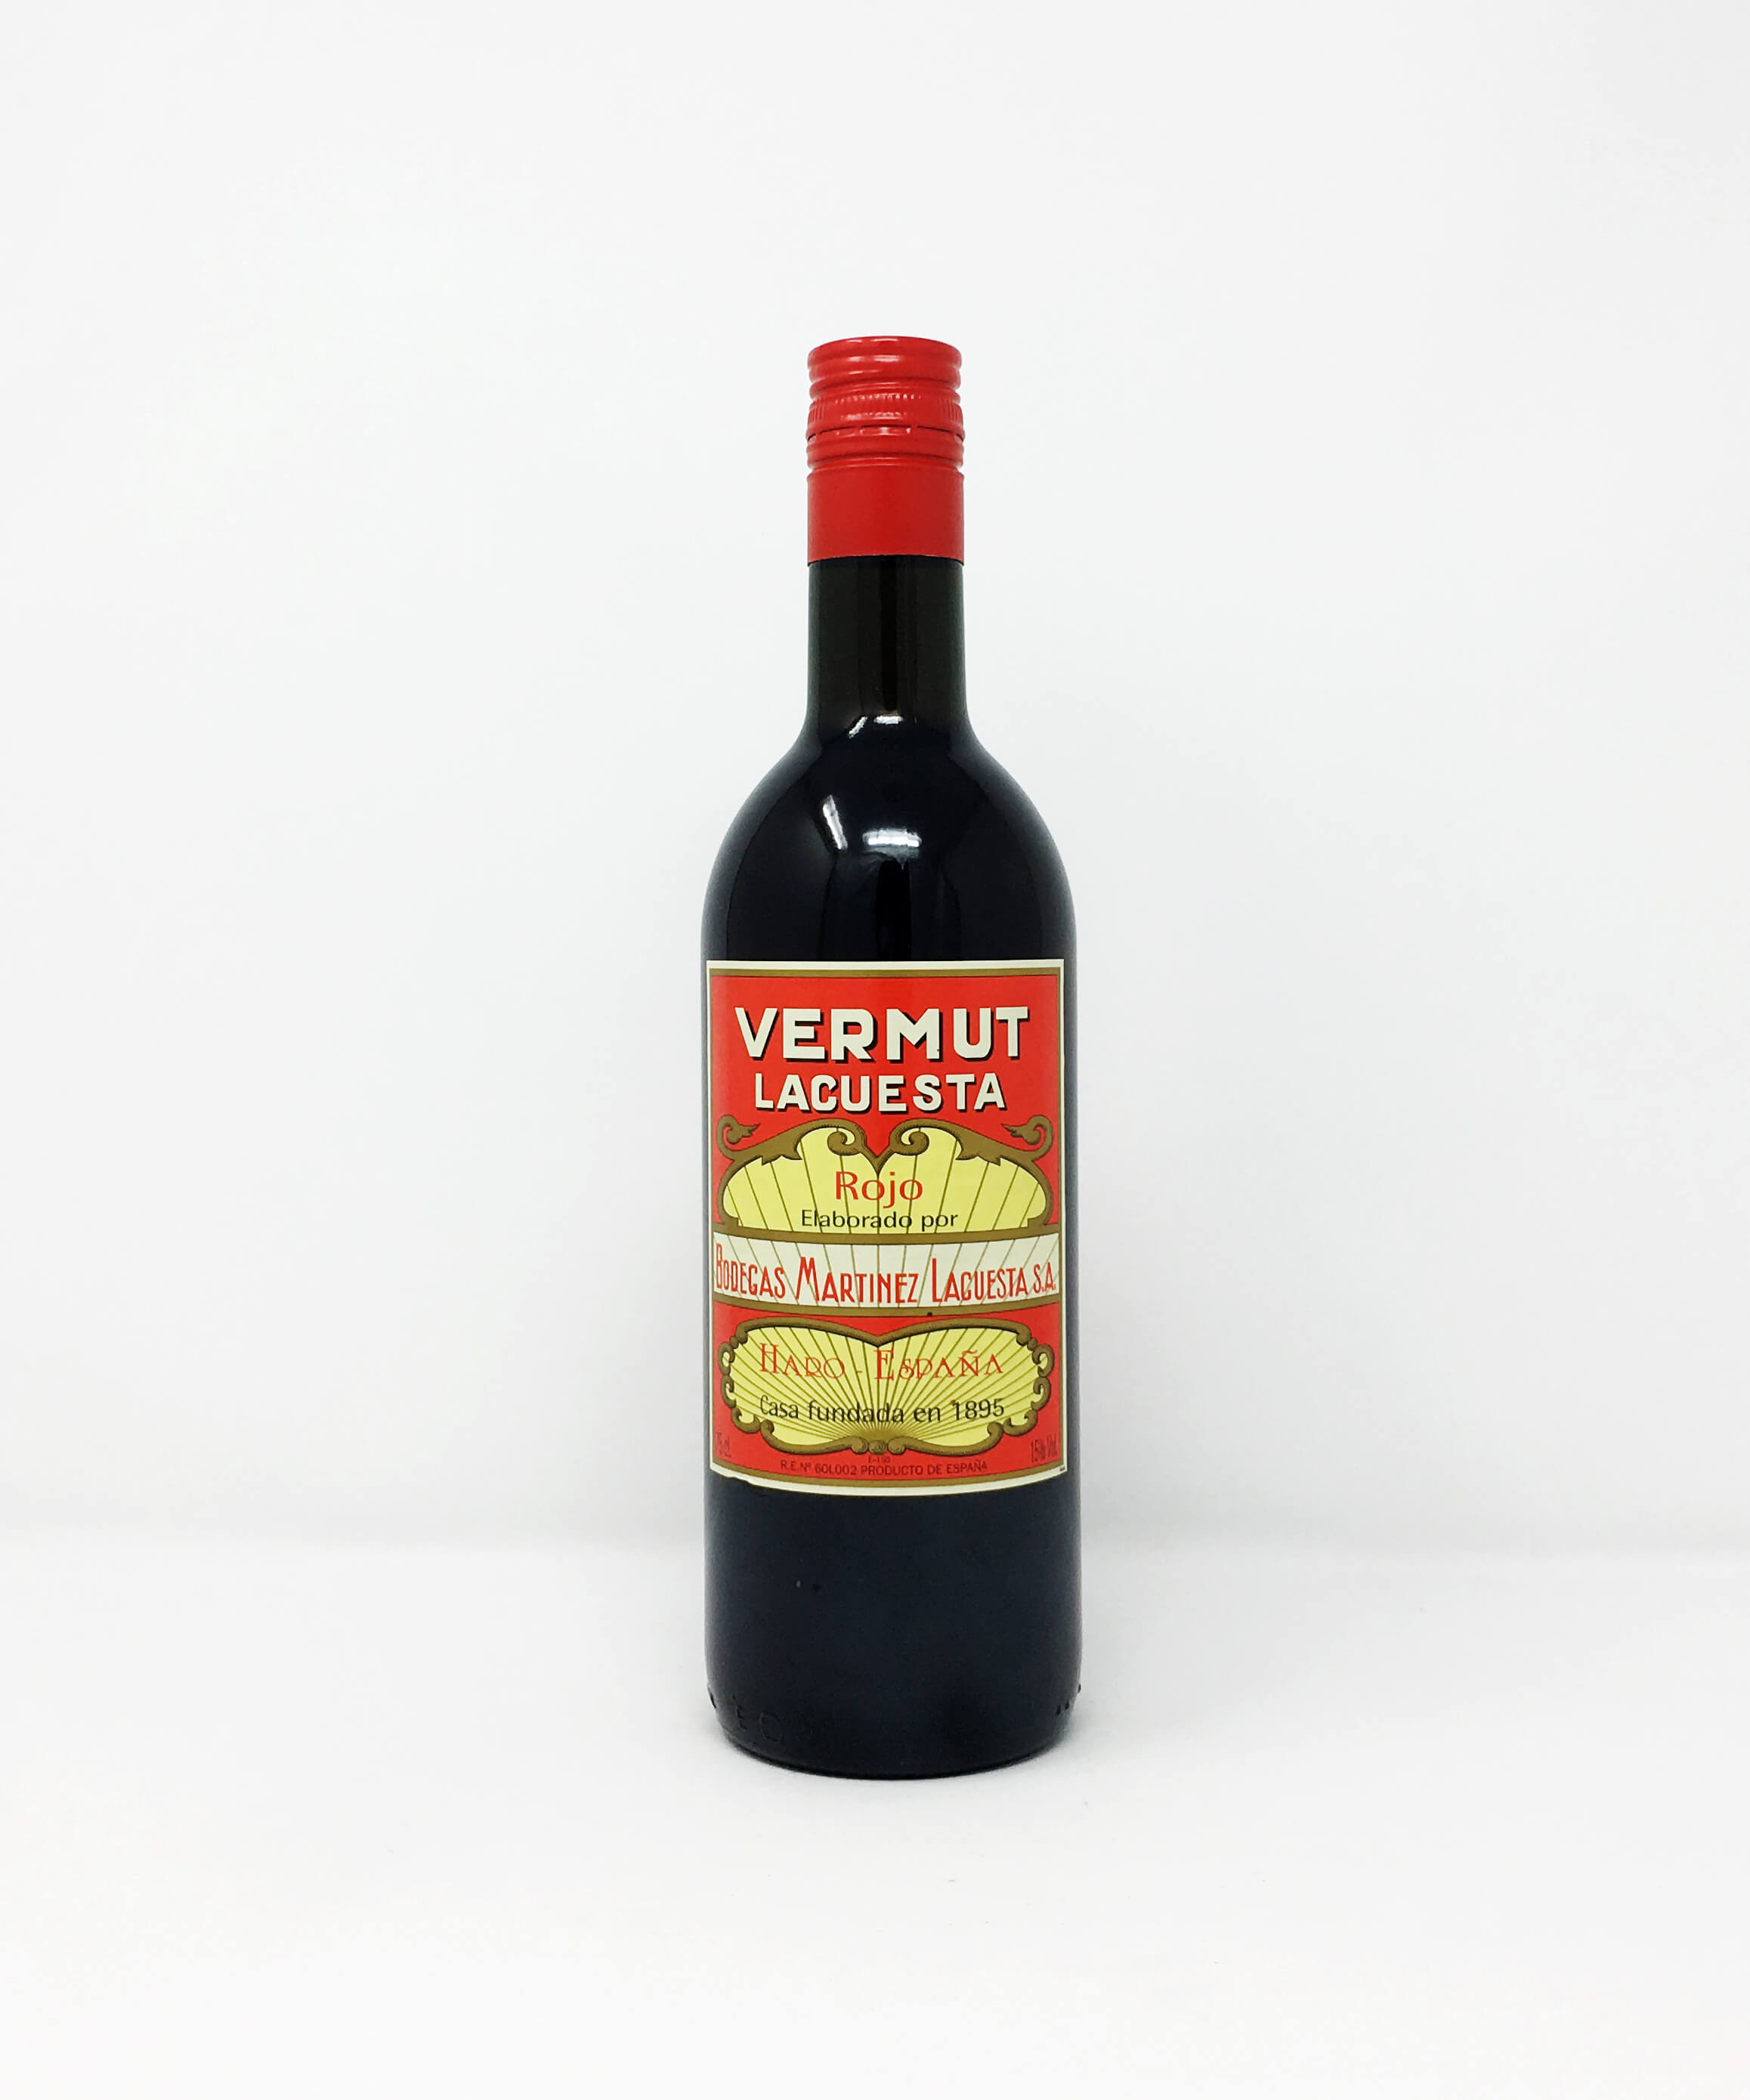 Bodegas Martinez Lacuesta, Vermut Rojo